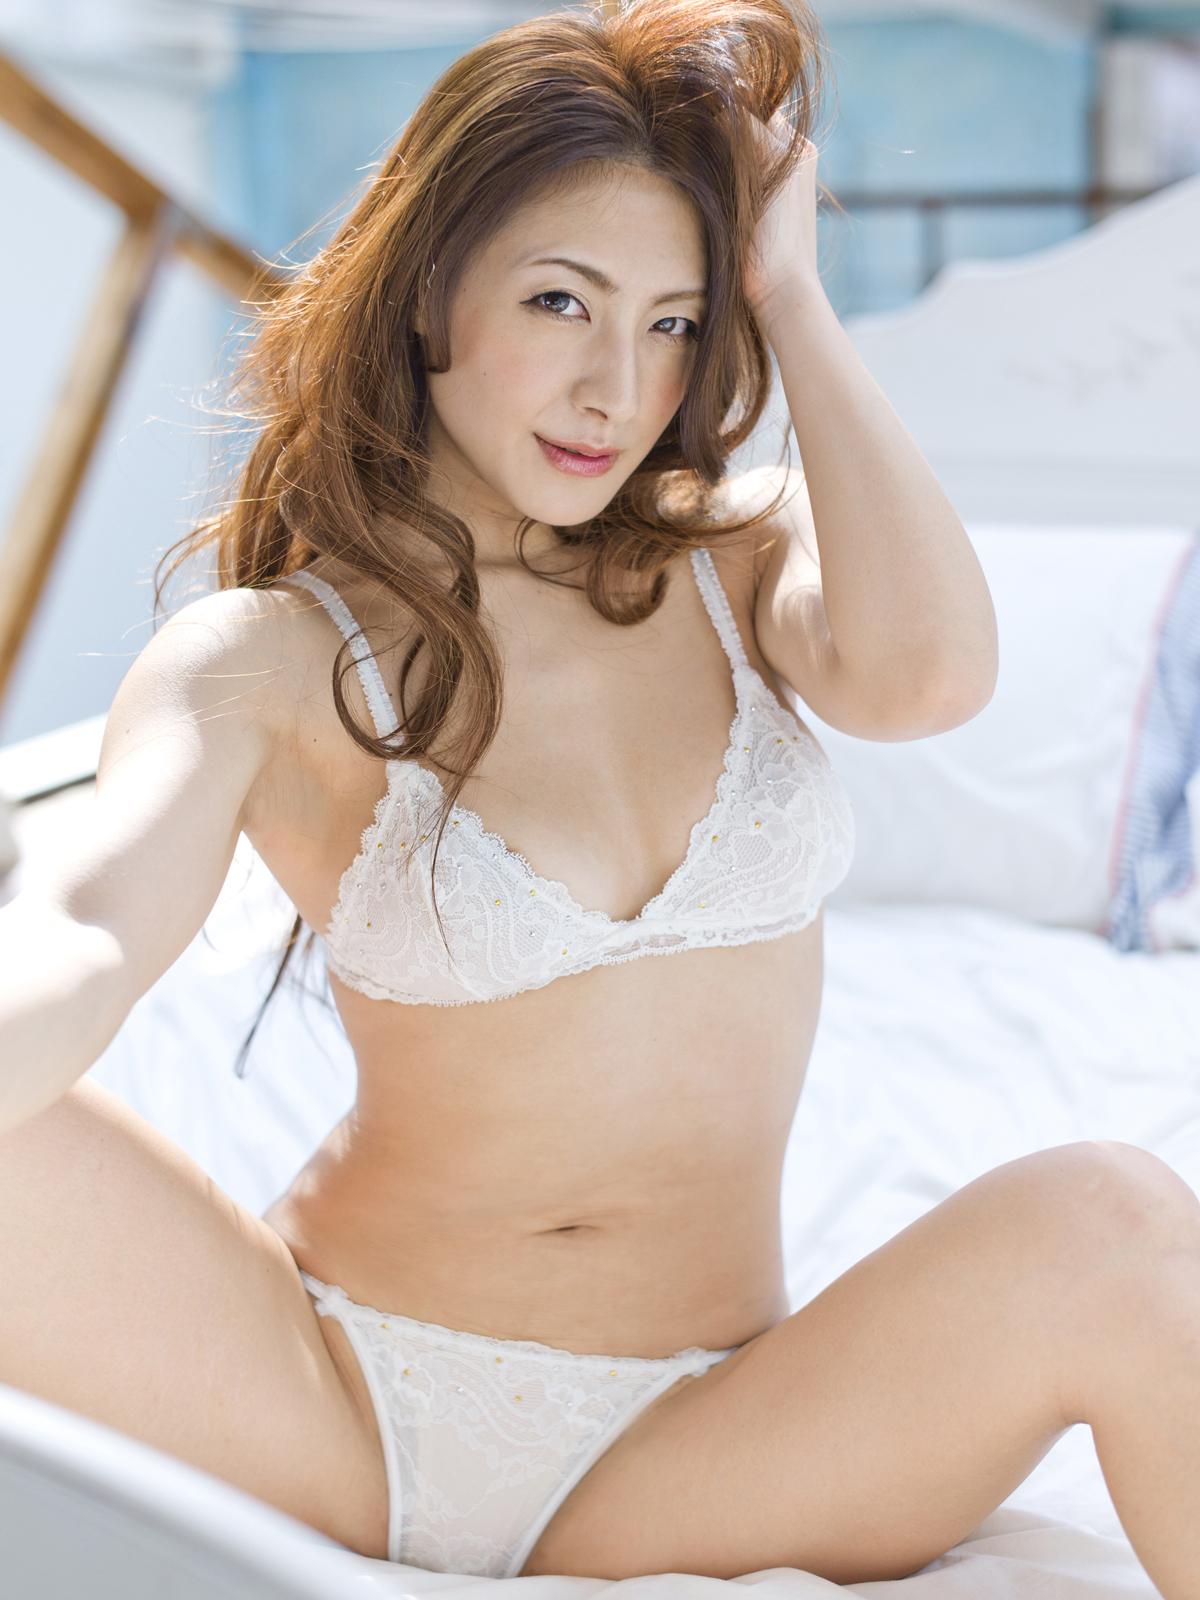 Sabra Net Rika Kawamur Bikini Picture Line Girl